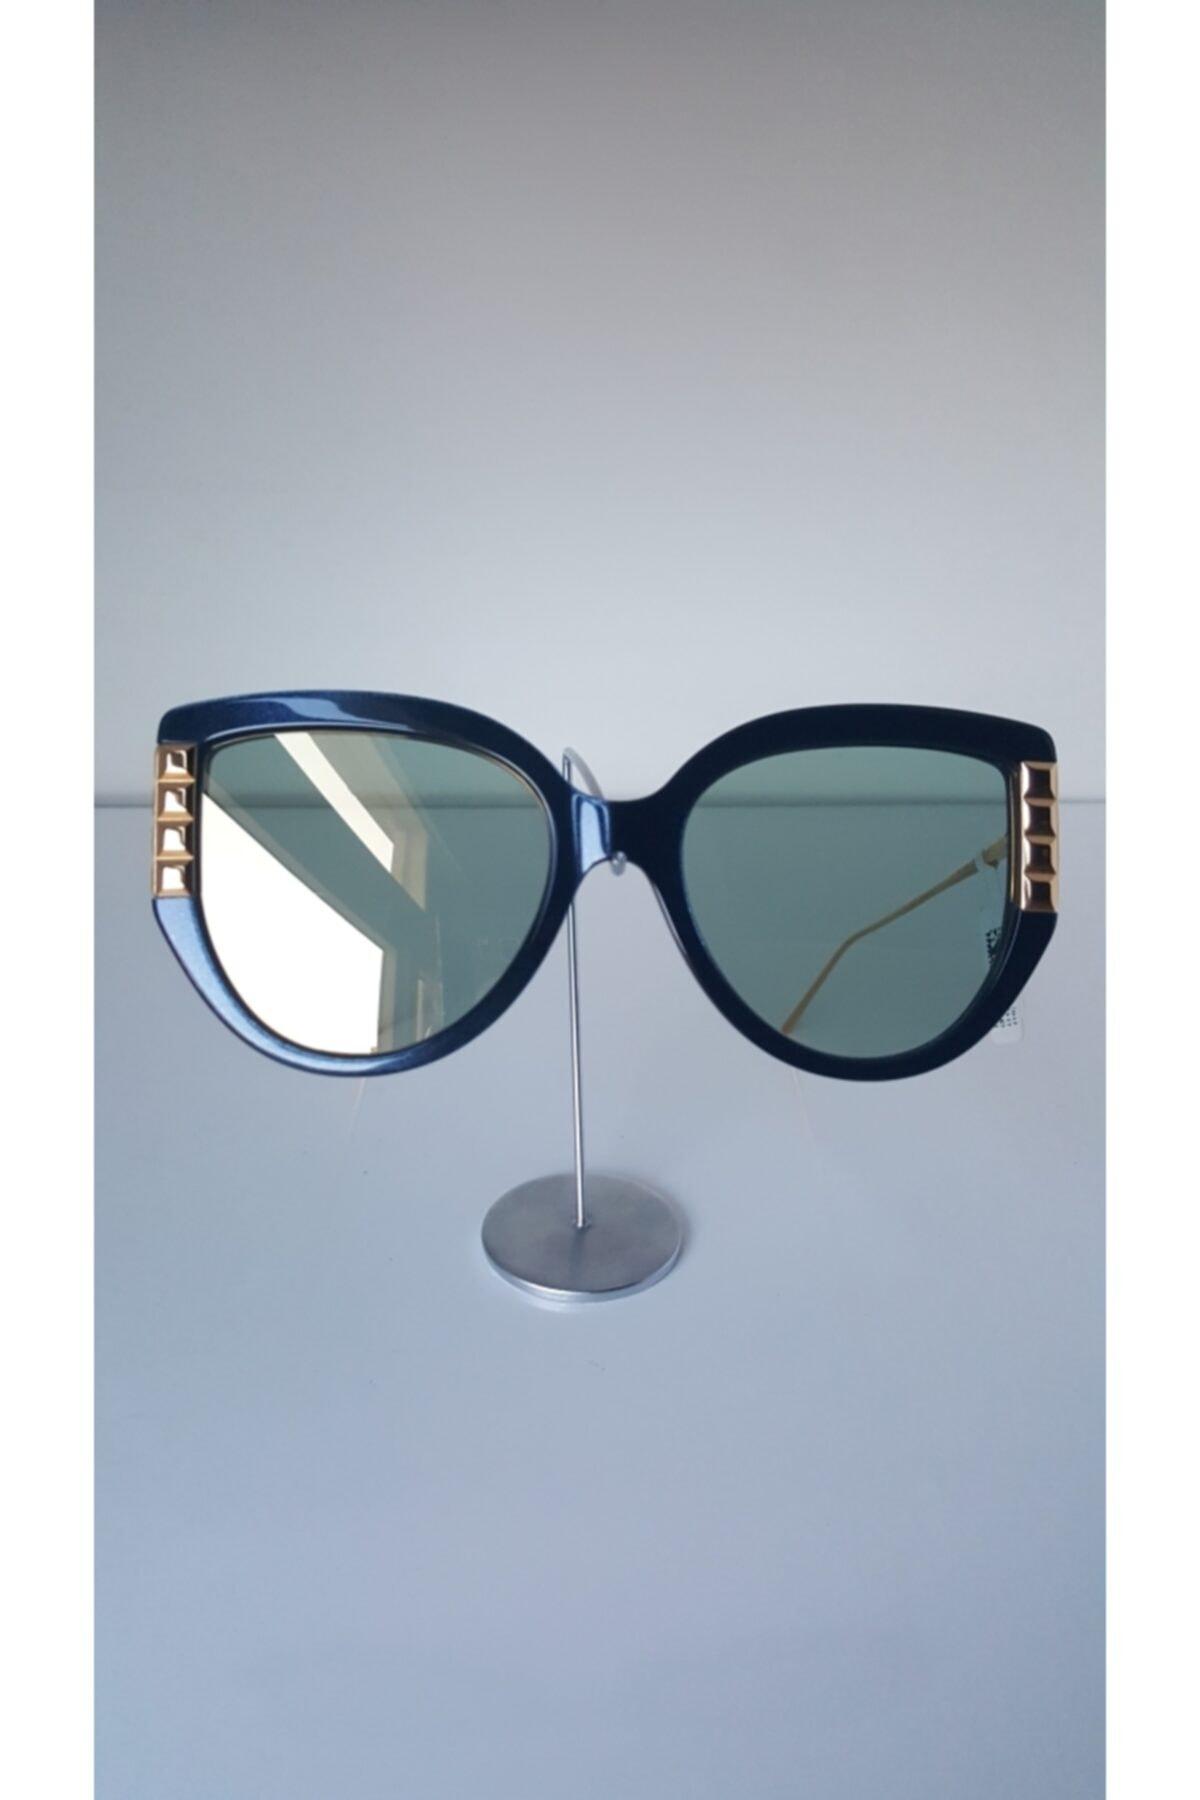 عینک آفتابی زیبا زنانه برند Boucheron رنگ خاکی کد ty68040942